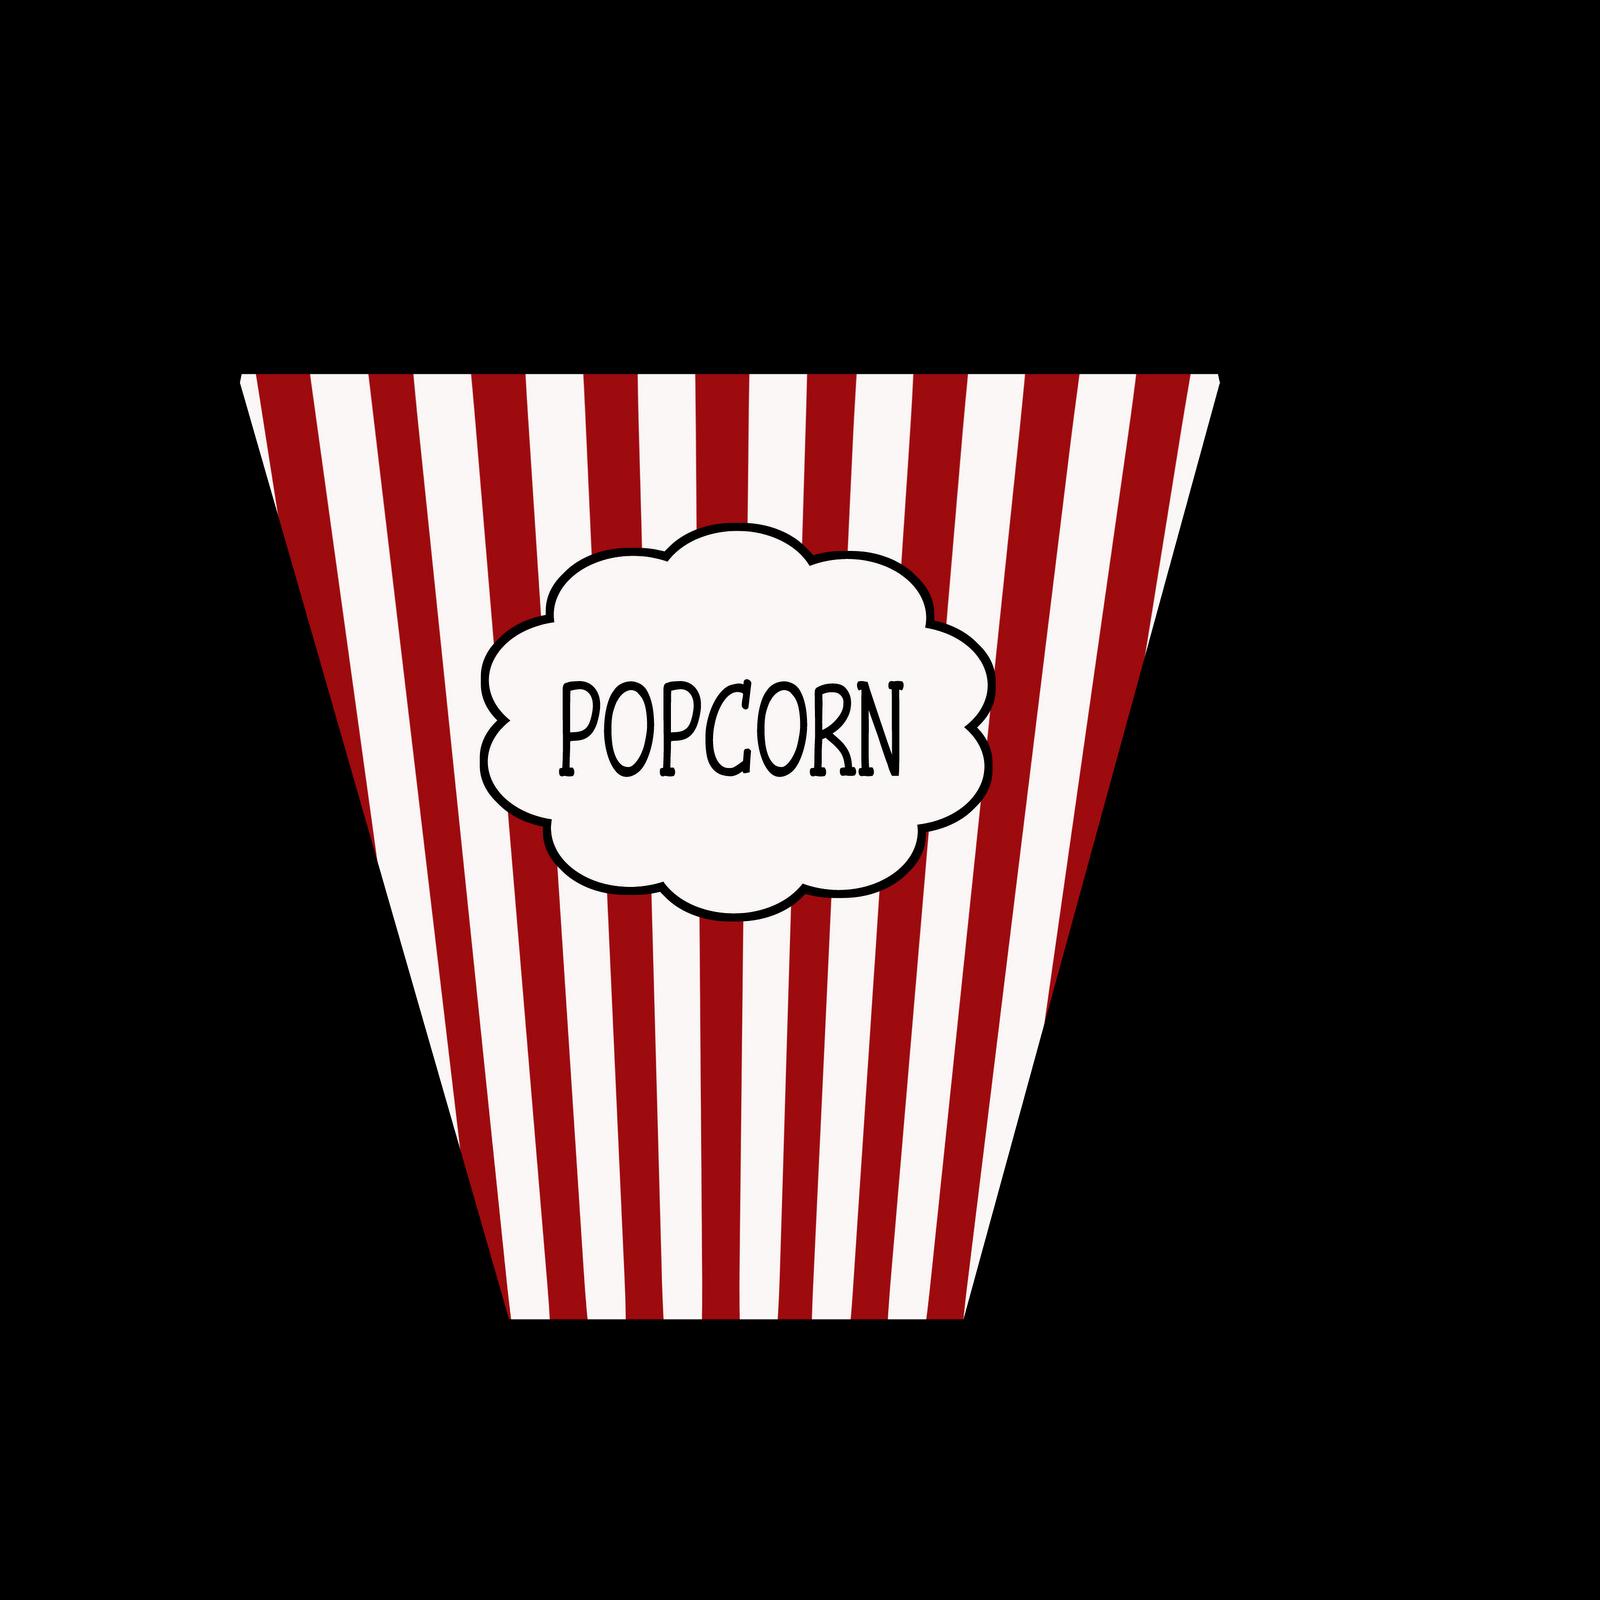 1600x1600 Clip Art Popcorn Dayasriola Top